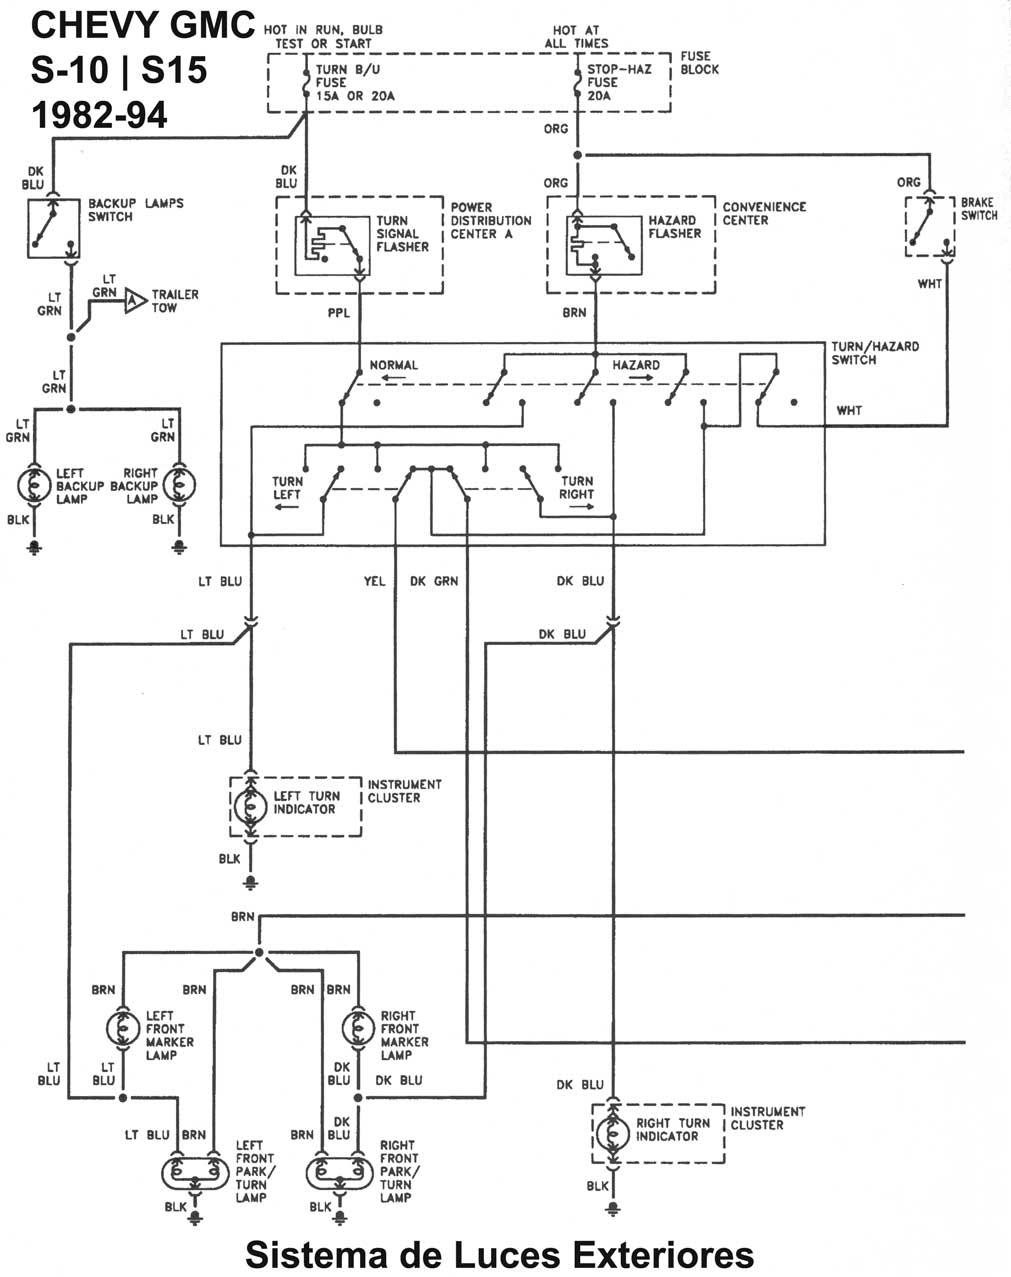 1986 Camaro Fuse Box Diagram Expert Schematics 86 Corvette Z28 Great Design Of Wiring U2022